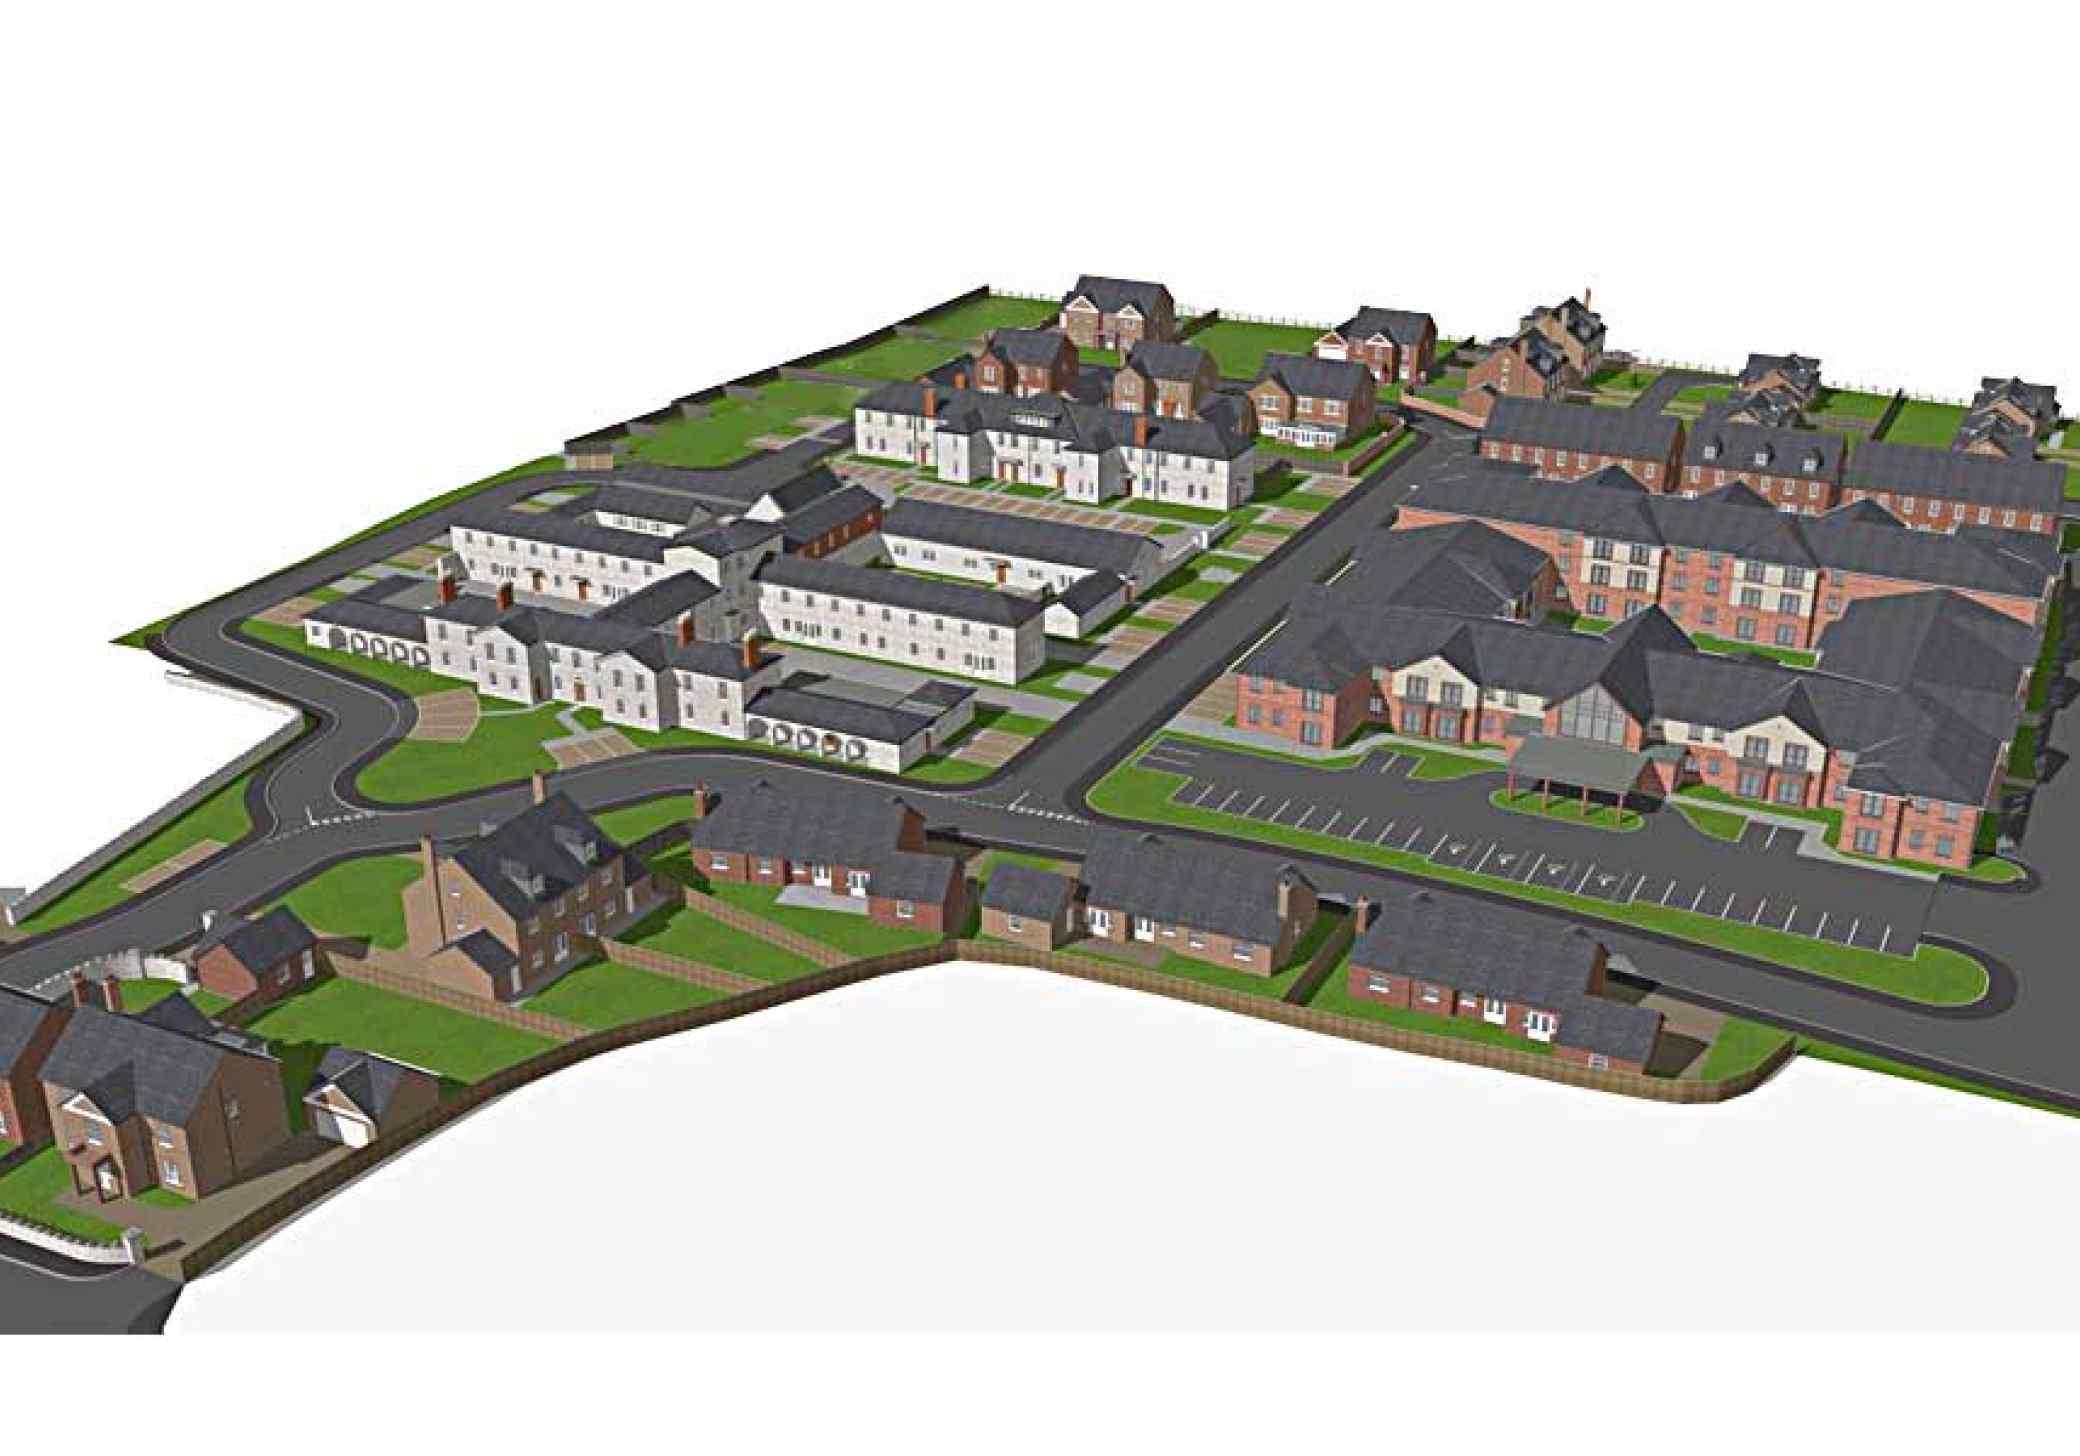 HM Stanley site plan illustration